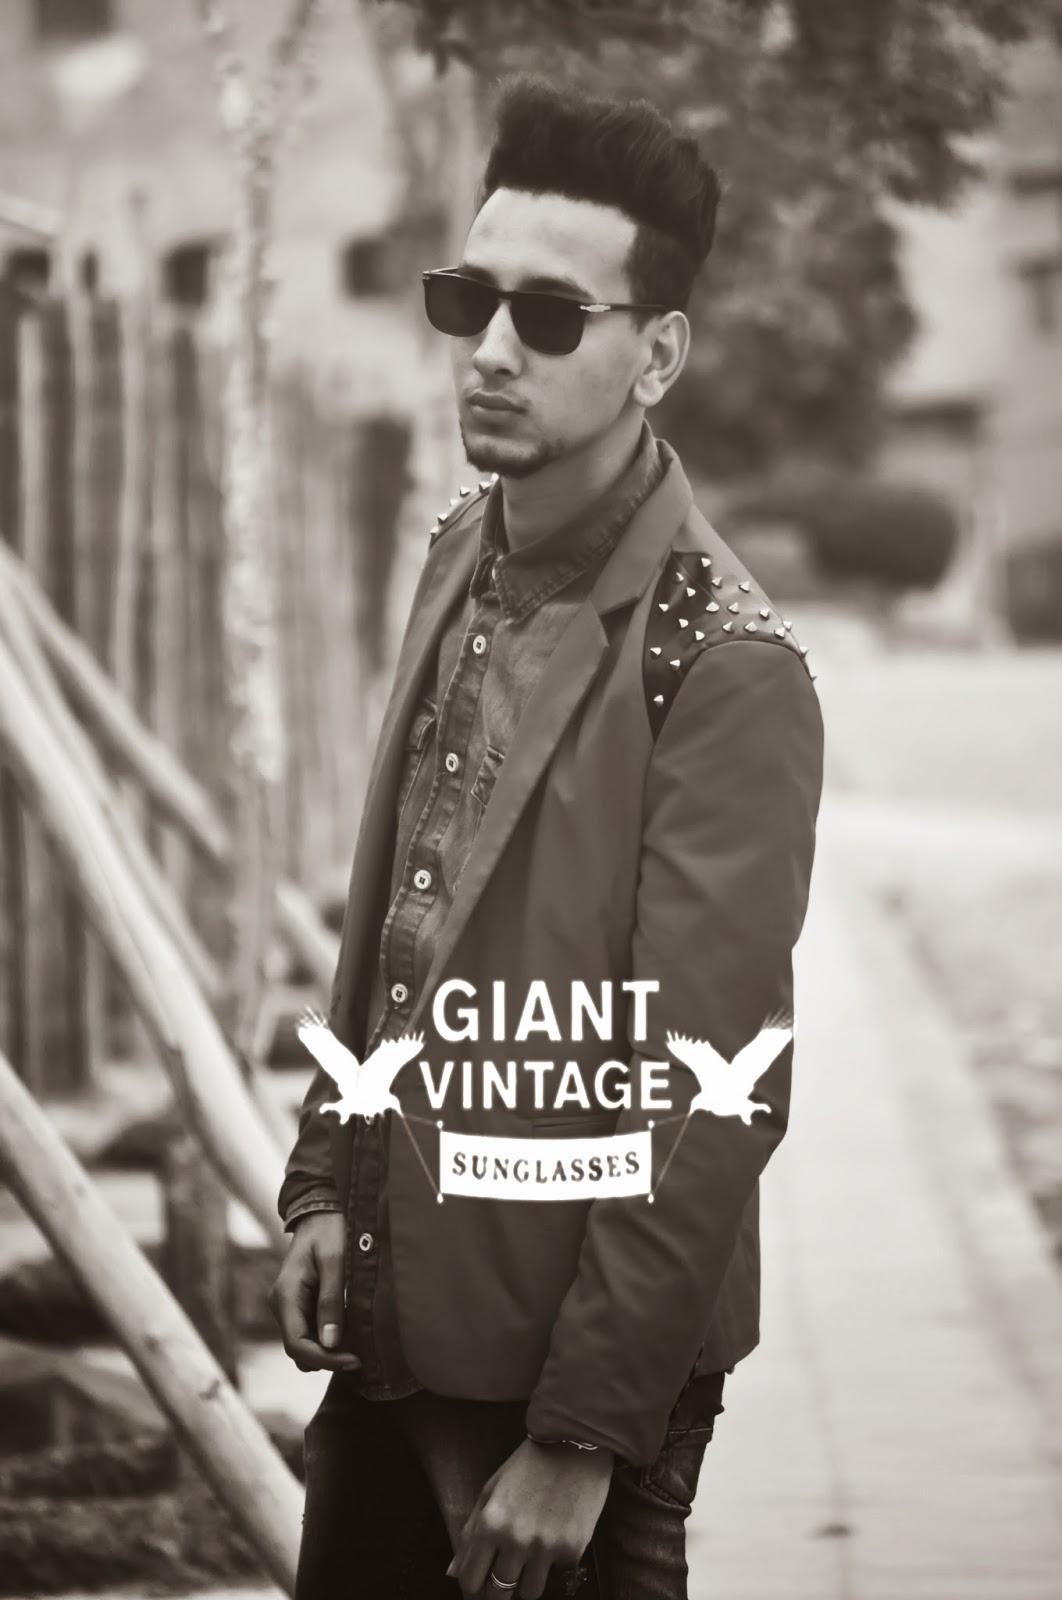 http://www.giantvintage.com/